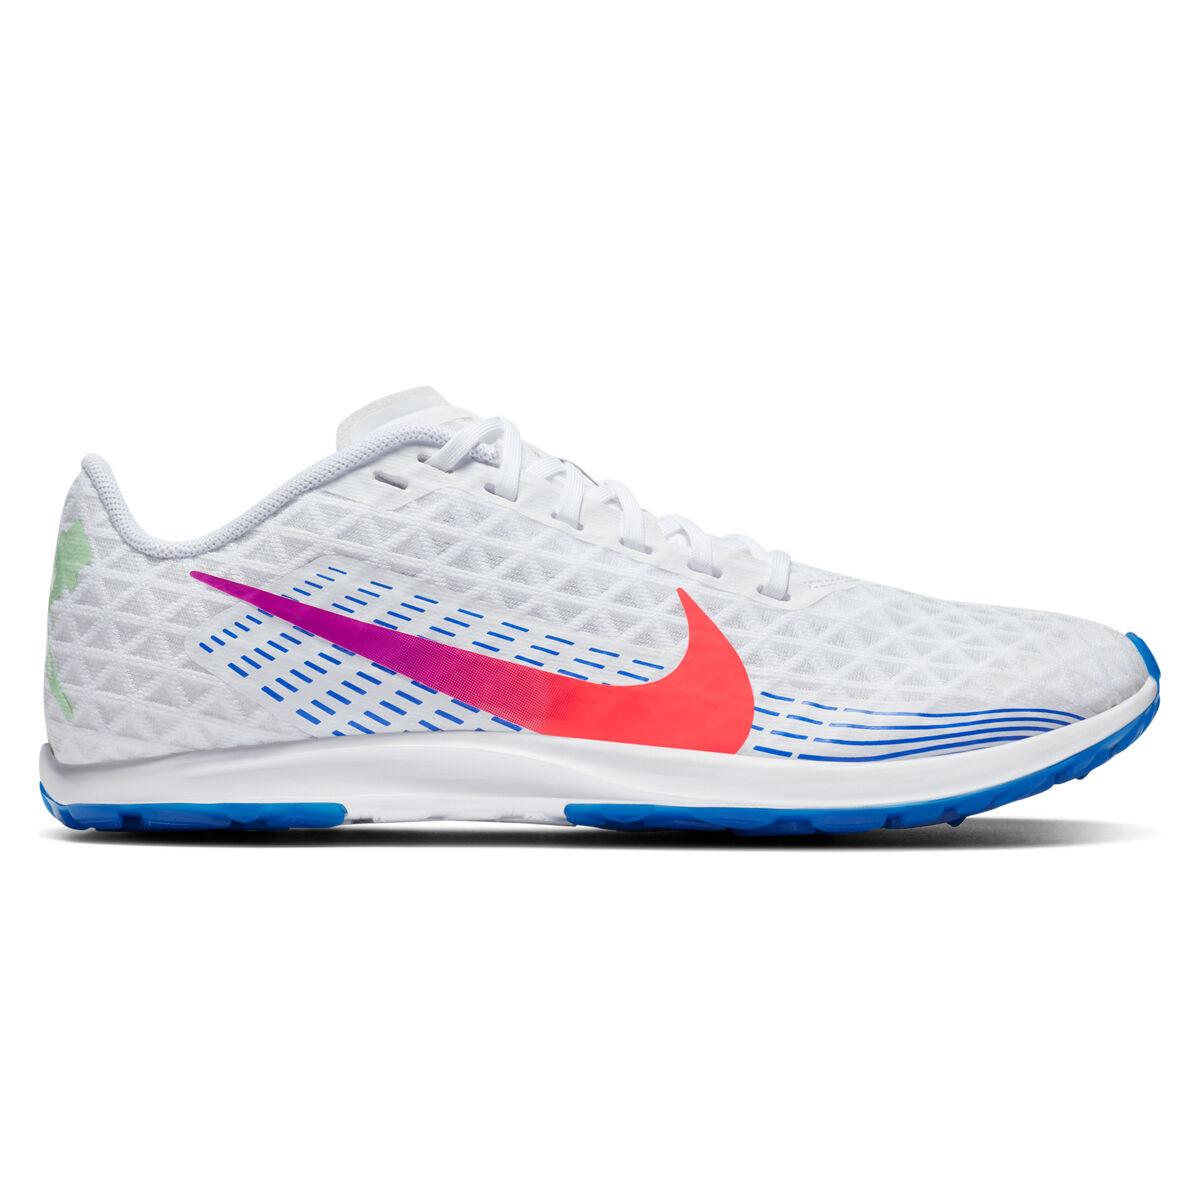 rebel sport running spikes